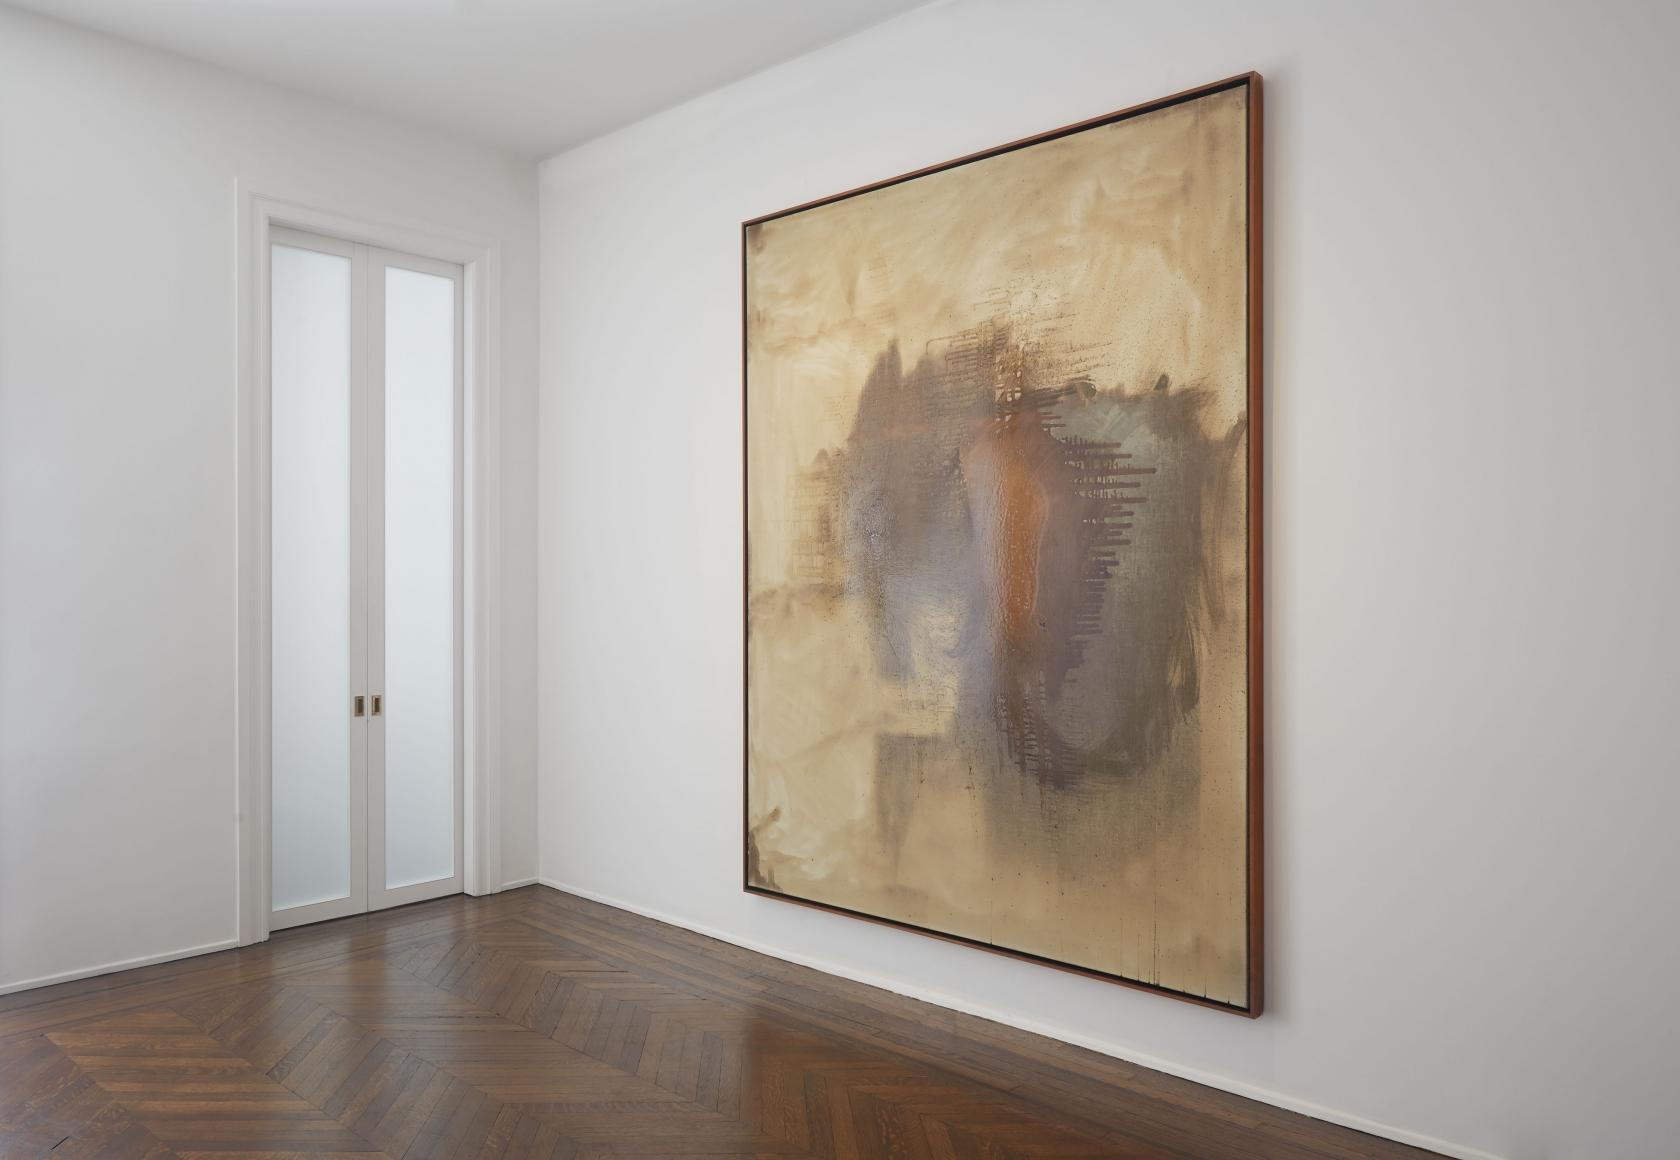 Sigmar Polke, Silver Paintings, New York, 2015, Installation Image 6